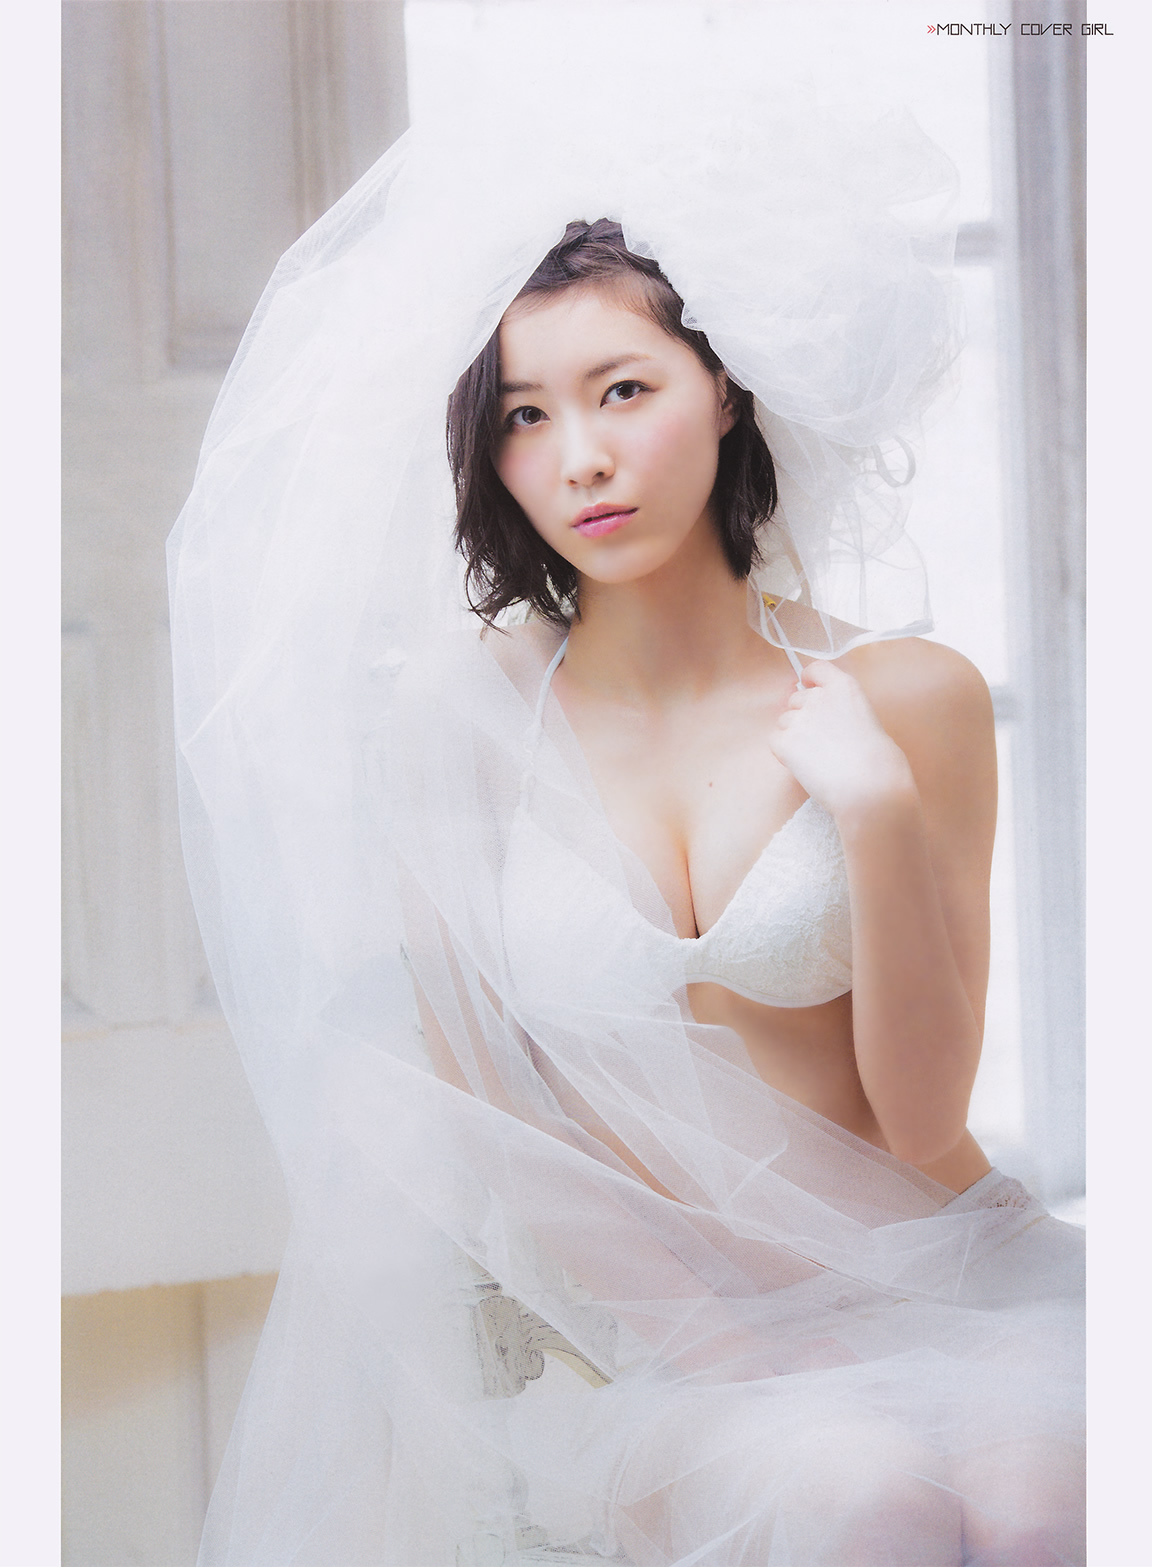 松井珠理奈の画像 p1_35